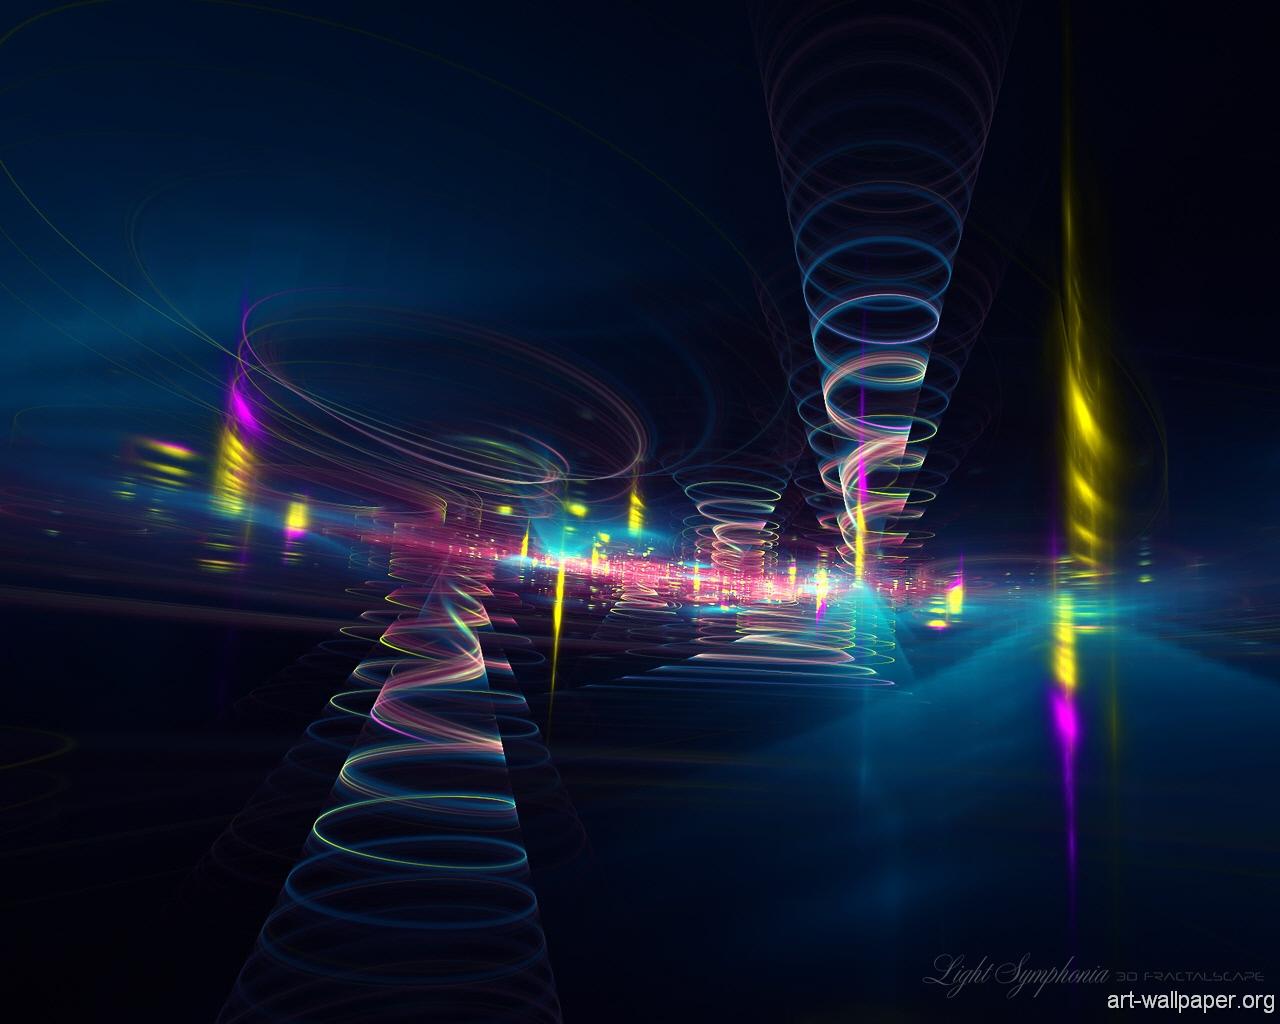 digital art fractal abstract hd wallpapers 083jpg 1280x1024